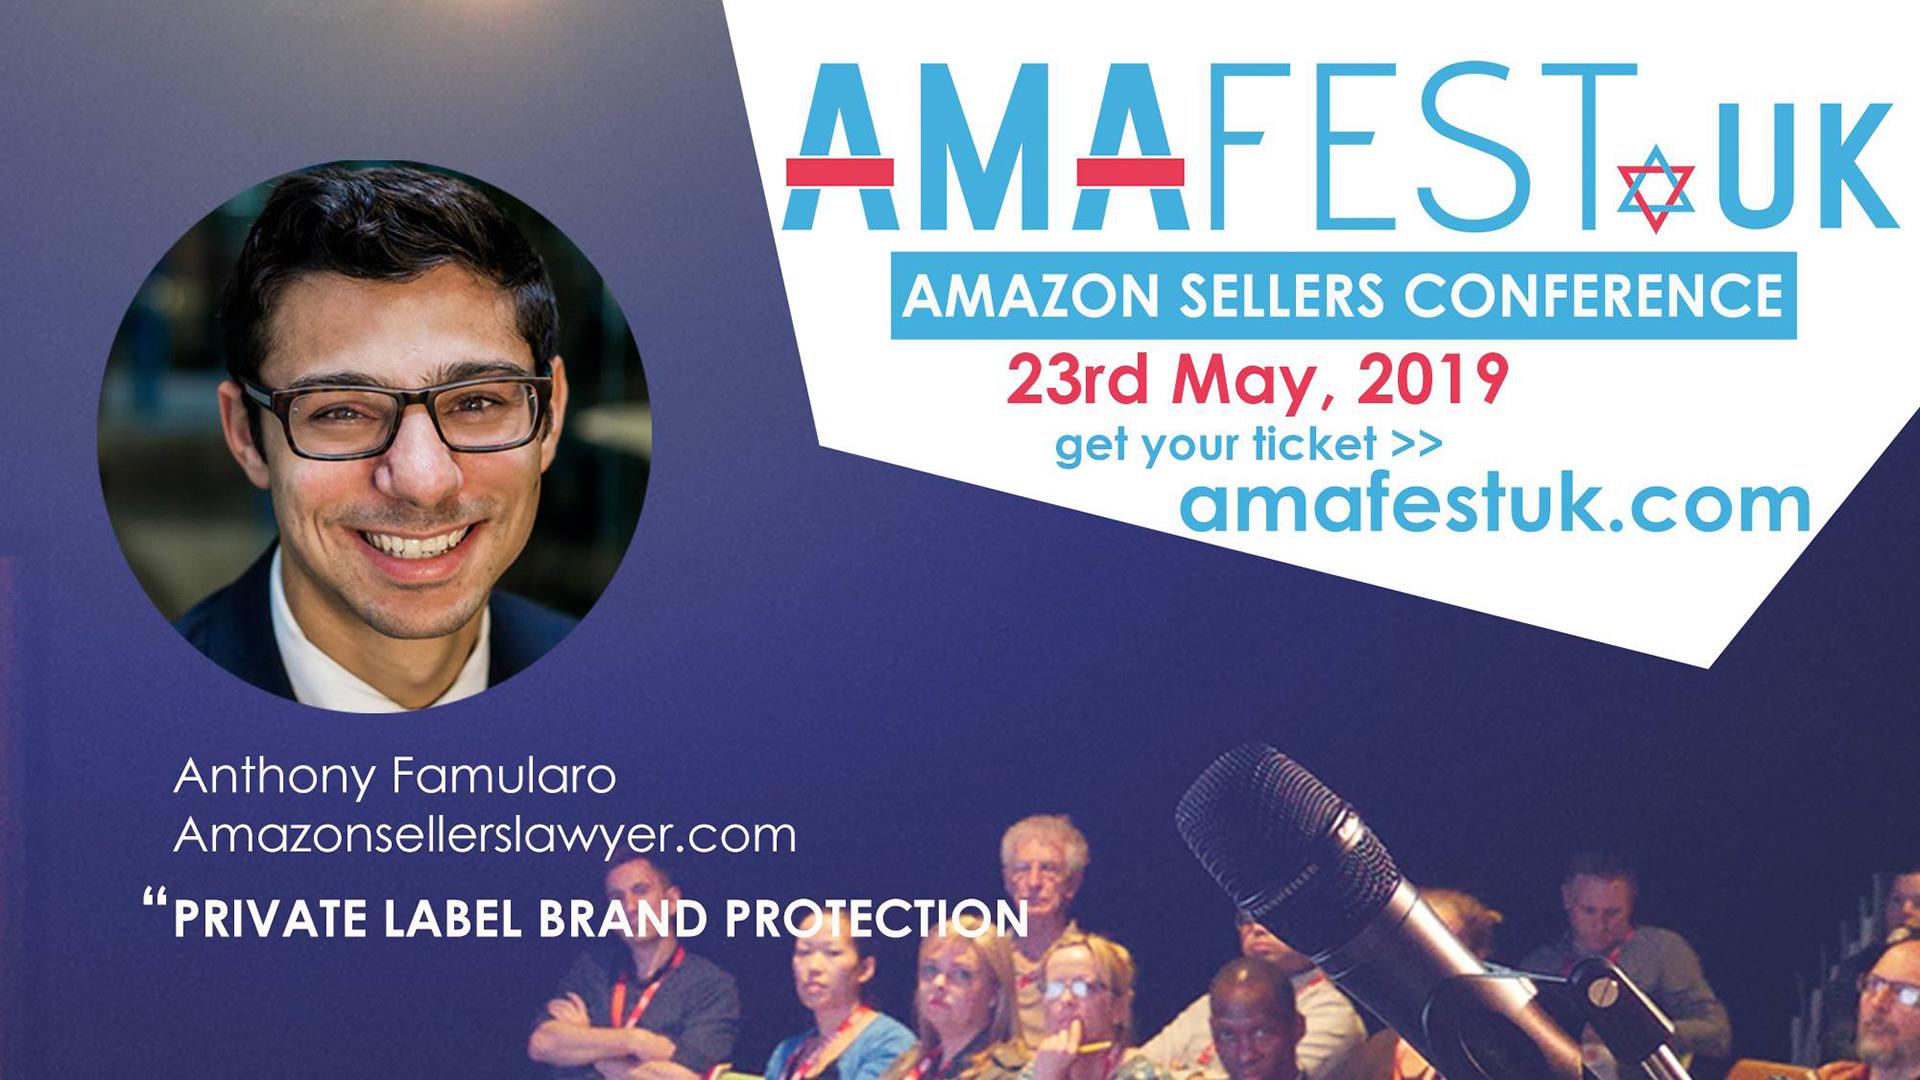 Amafest